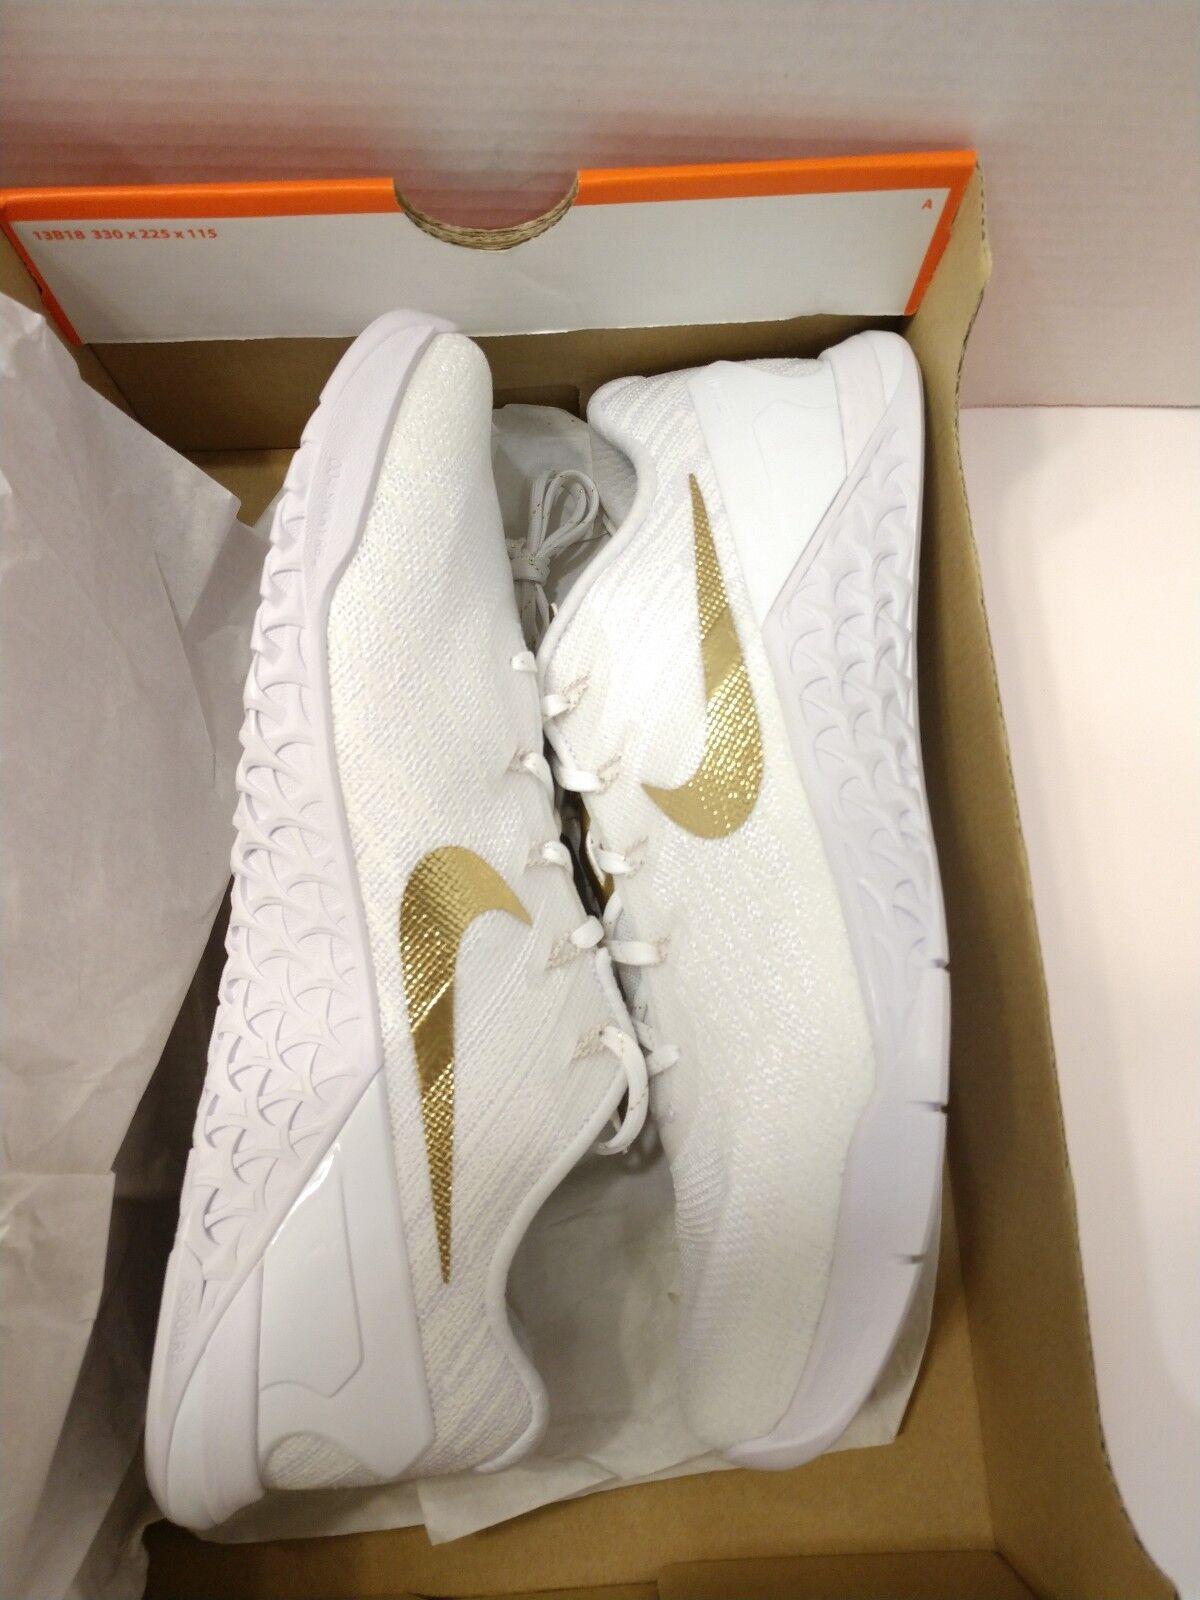 Nike Metcon 3 AMP Training Running CrossFit Shoes Women's 11 White Metallic Gold